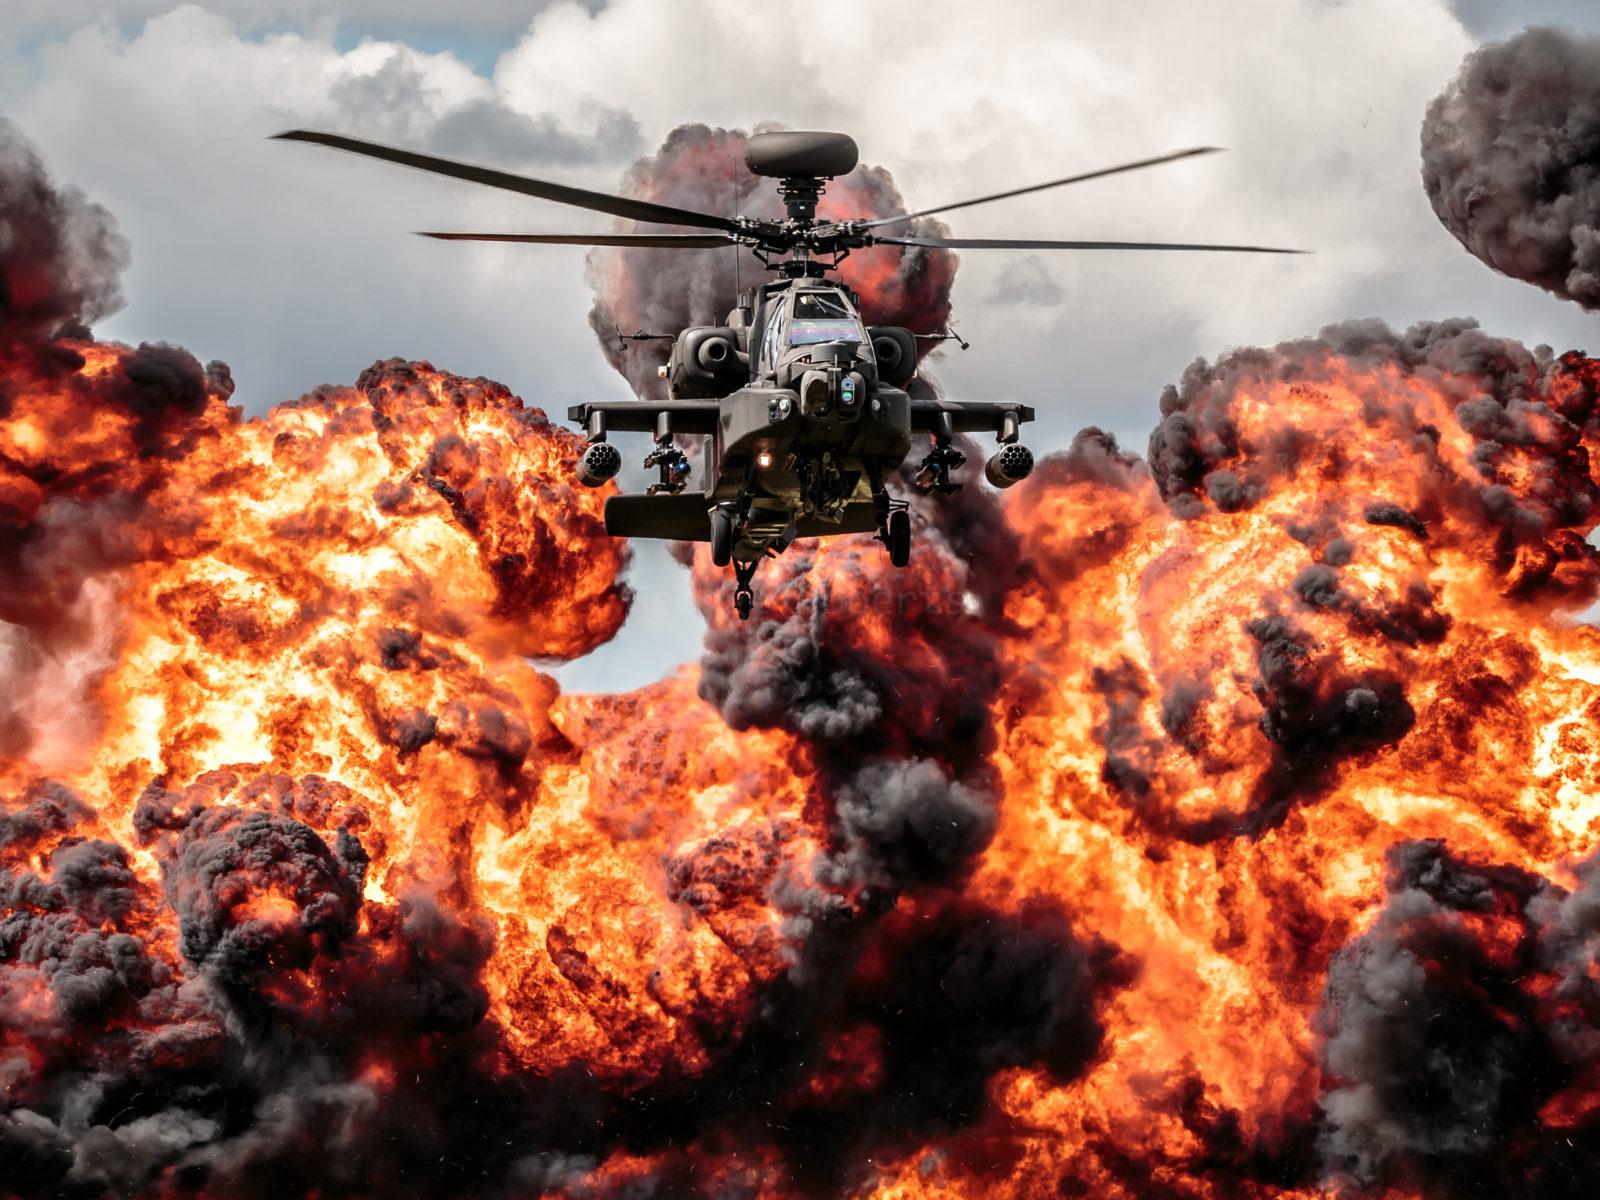 Hd Wallpapers Fire Cars Helicopter Apache Explosion Fire Hd Desktop Wallpaper